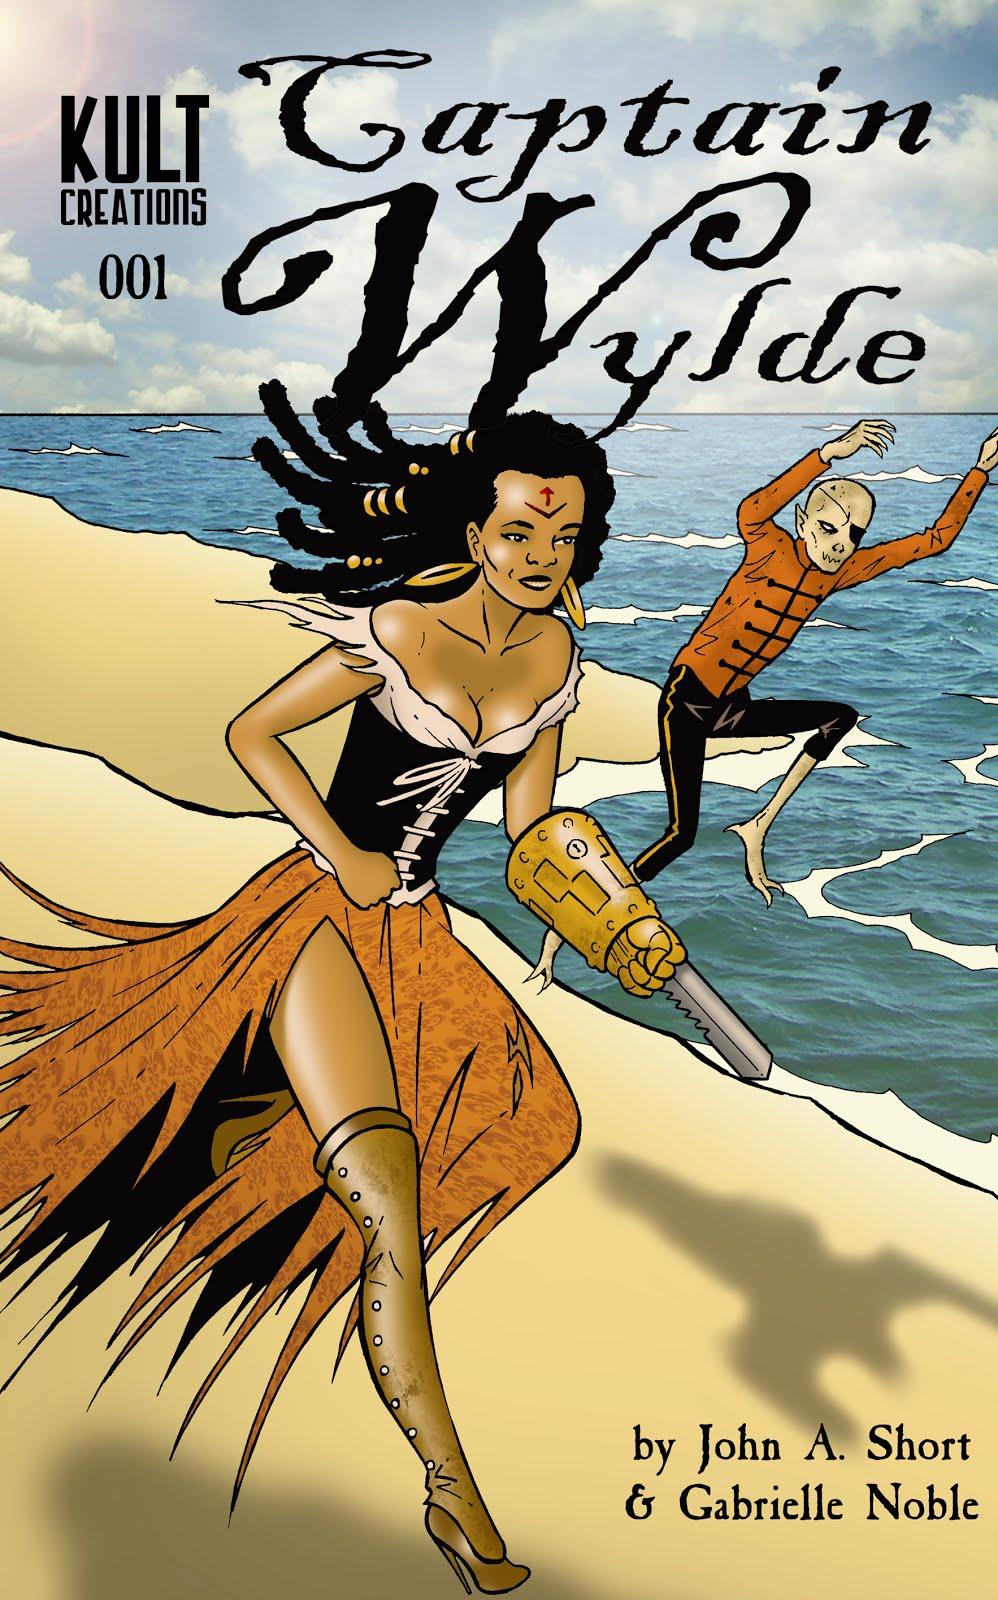 Buy CAPTAIN WYLDE 001 Digital version below!